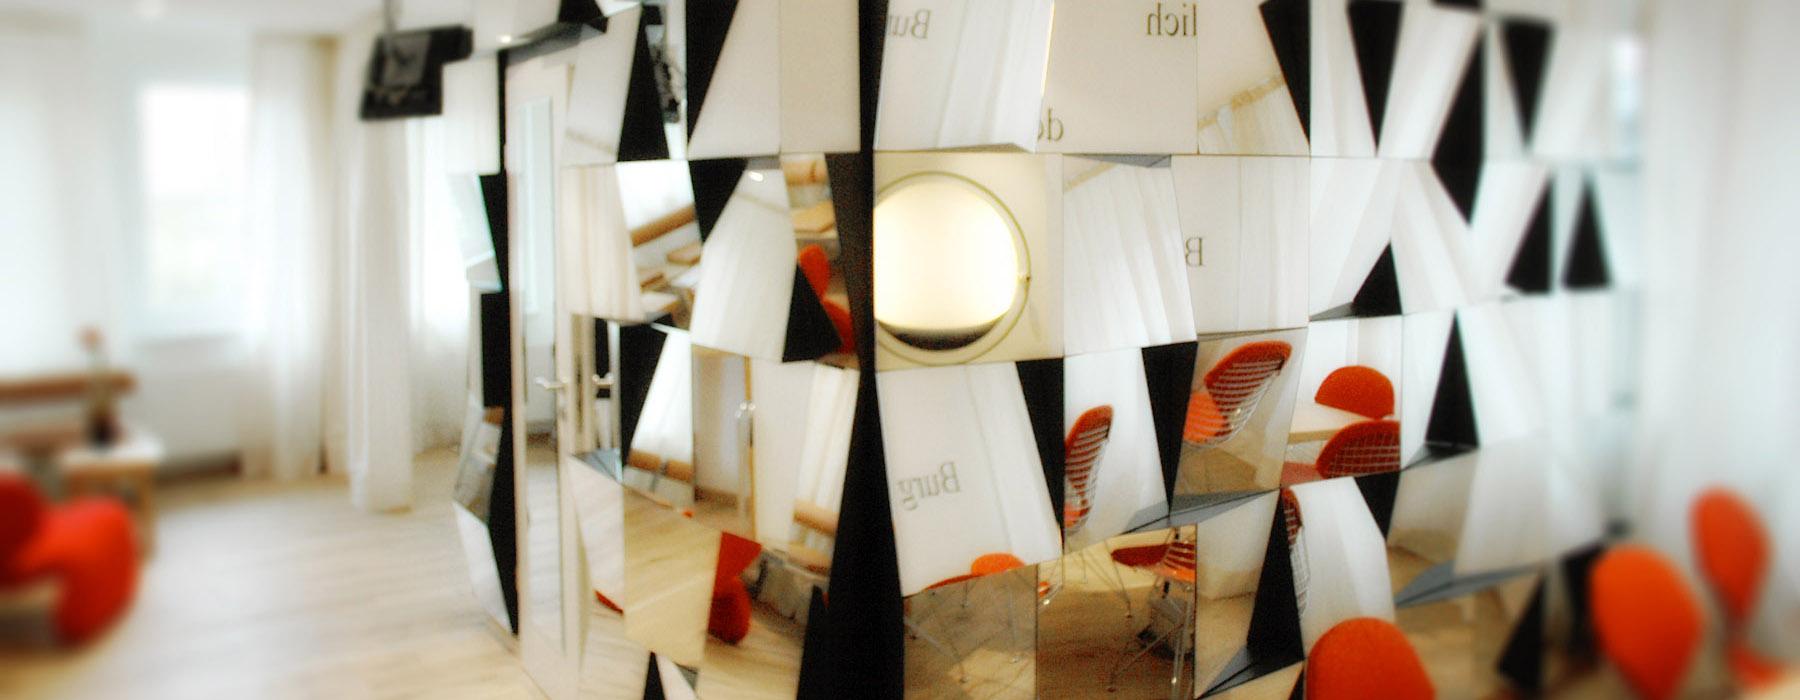 hotel drei raben n rnberg die zimmer rabenspiegel. Black Bedroom Furniture Sets. Home Design Ideas